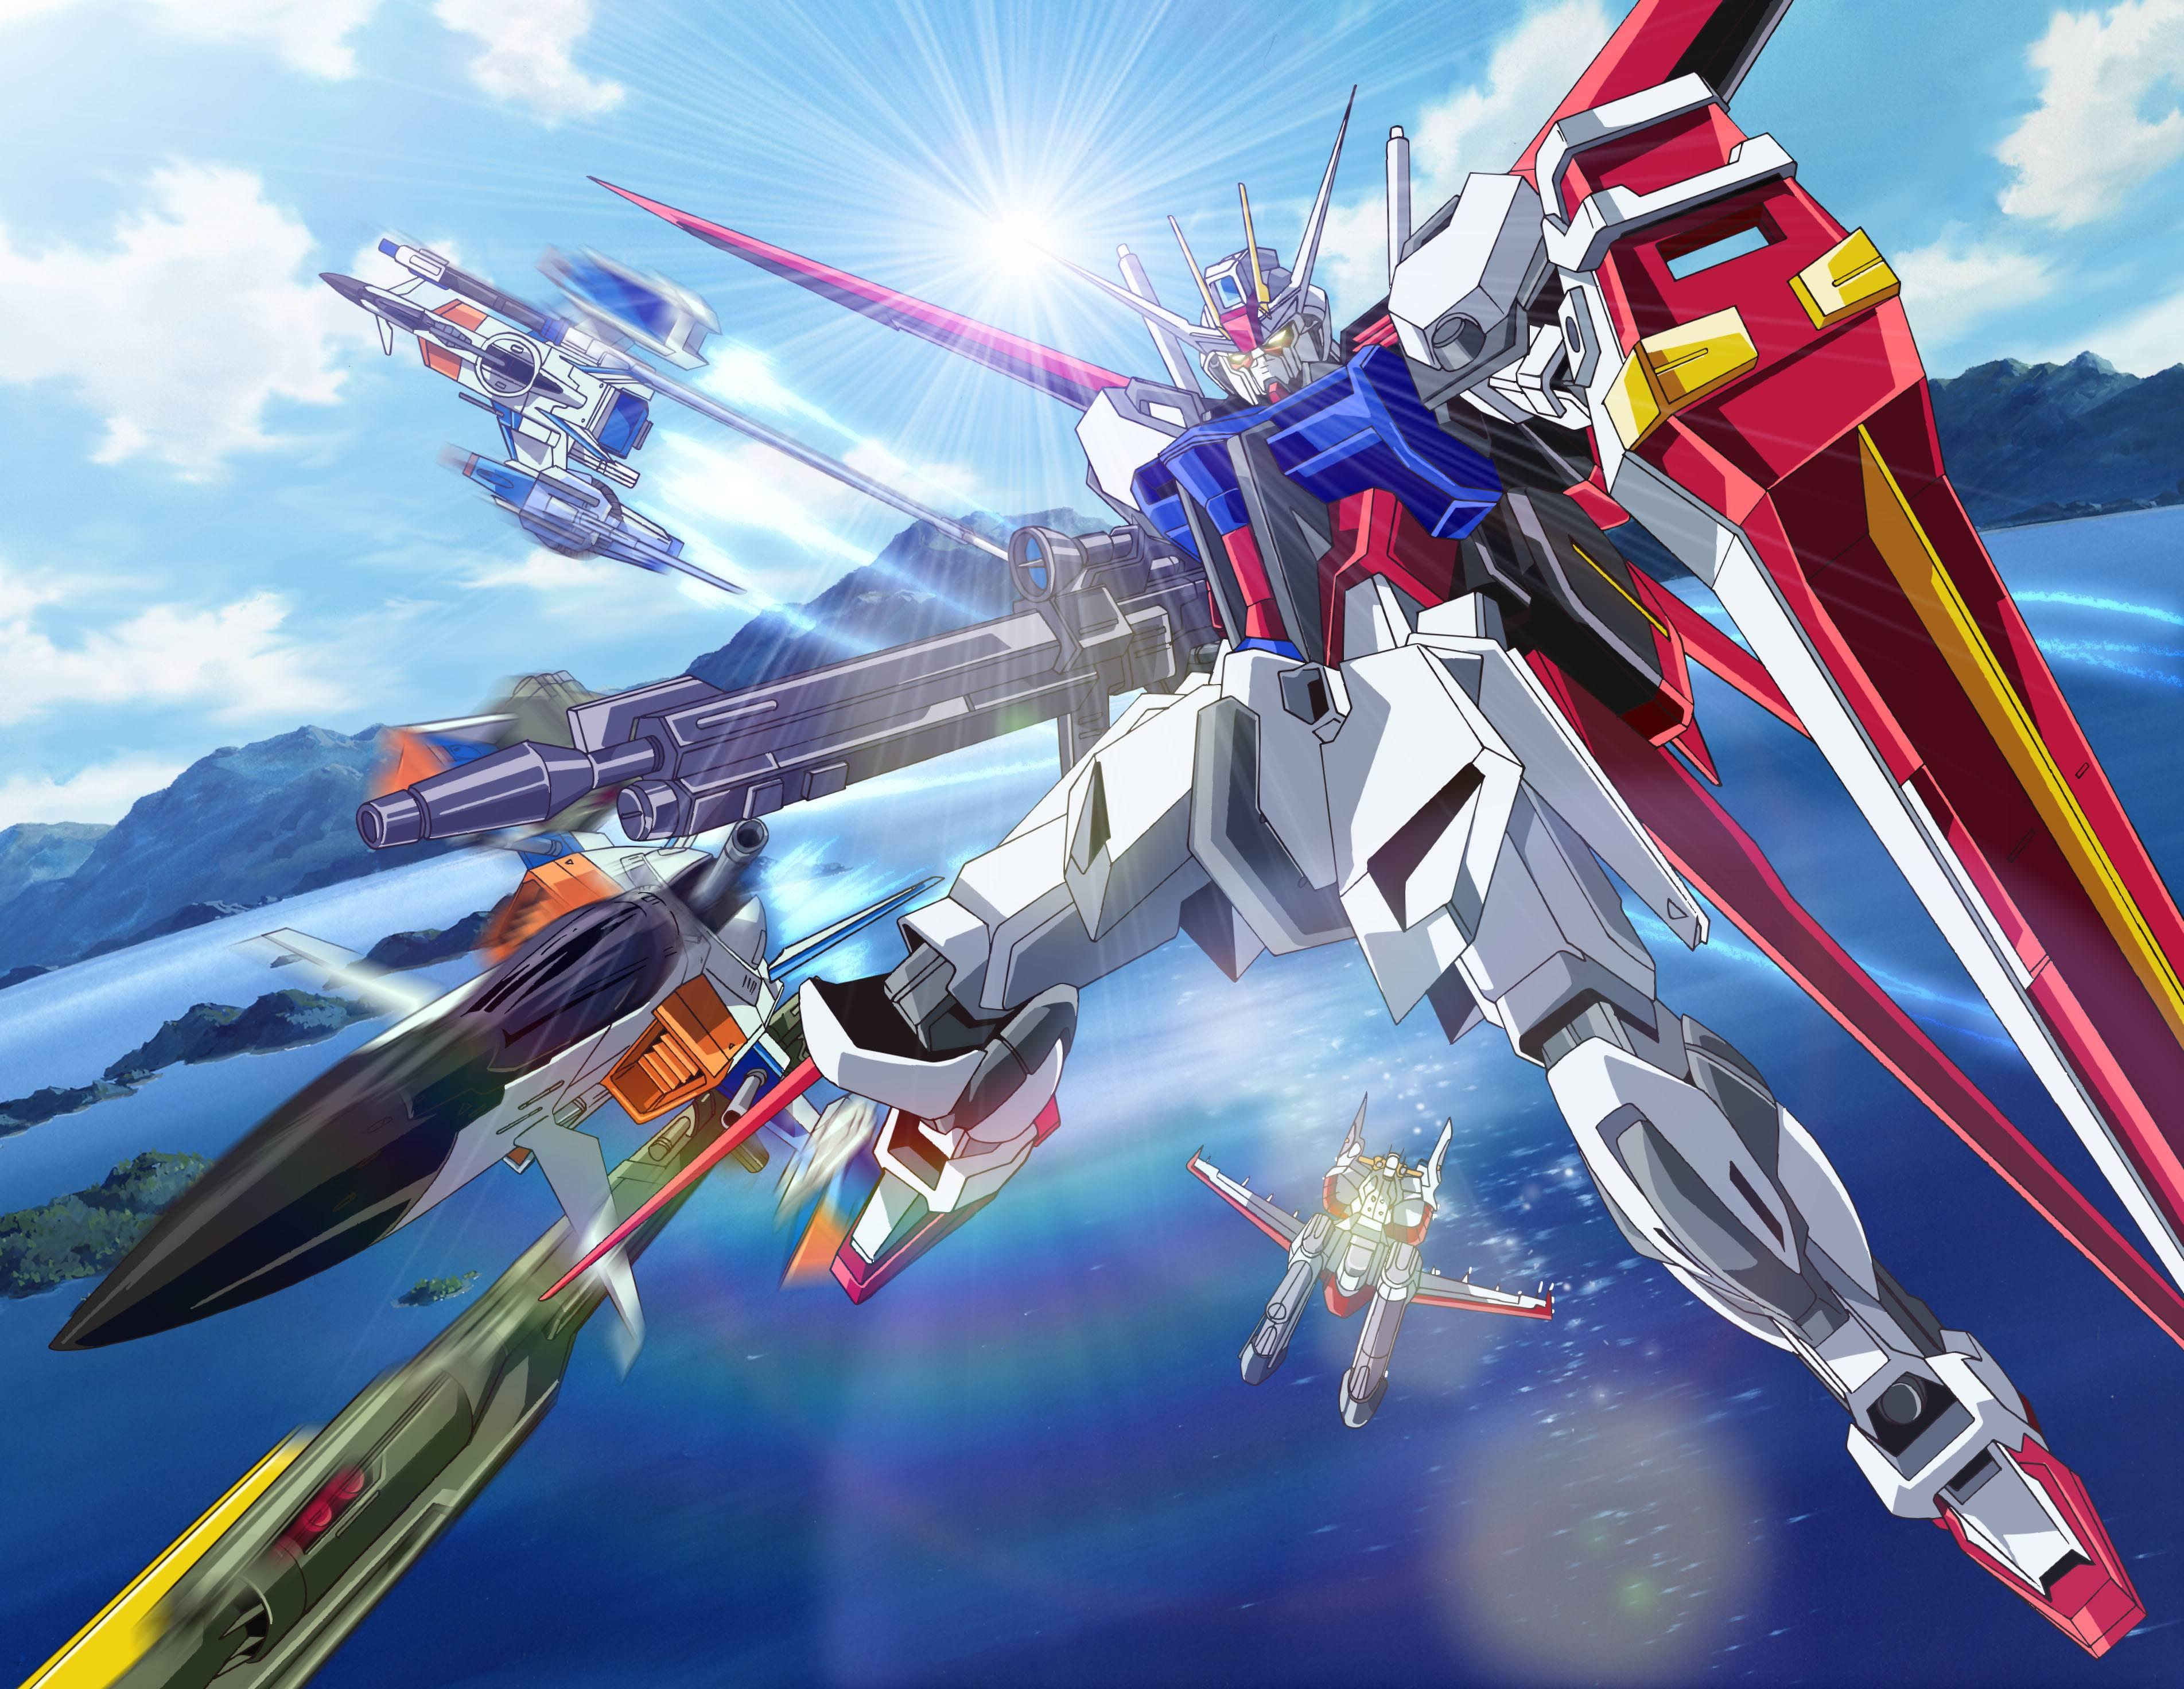 30 Mobile Suit Gundam Seed Destiny Backgrounds Hq Dmitry Janisson